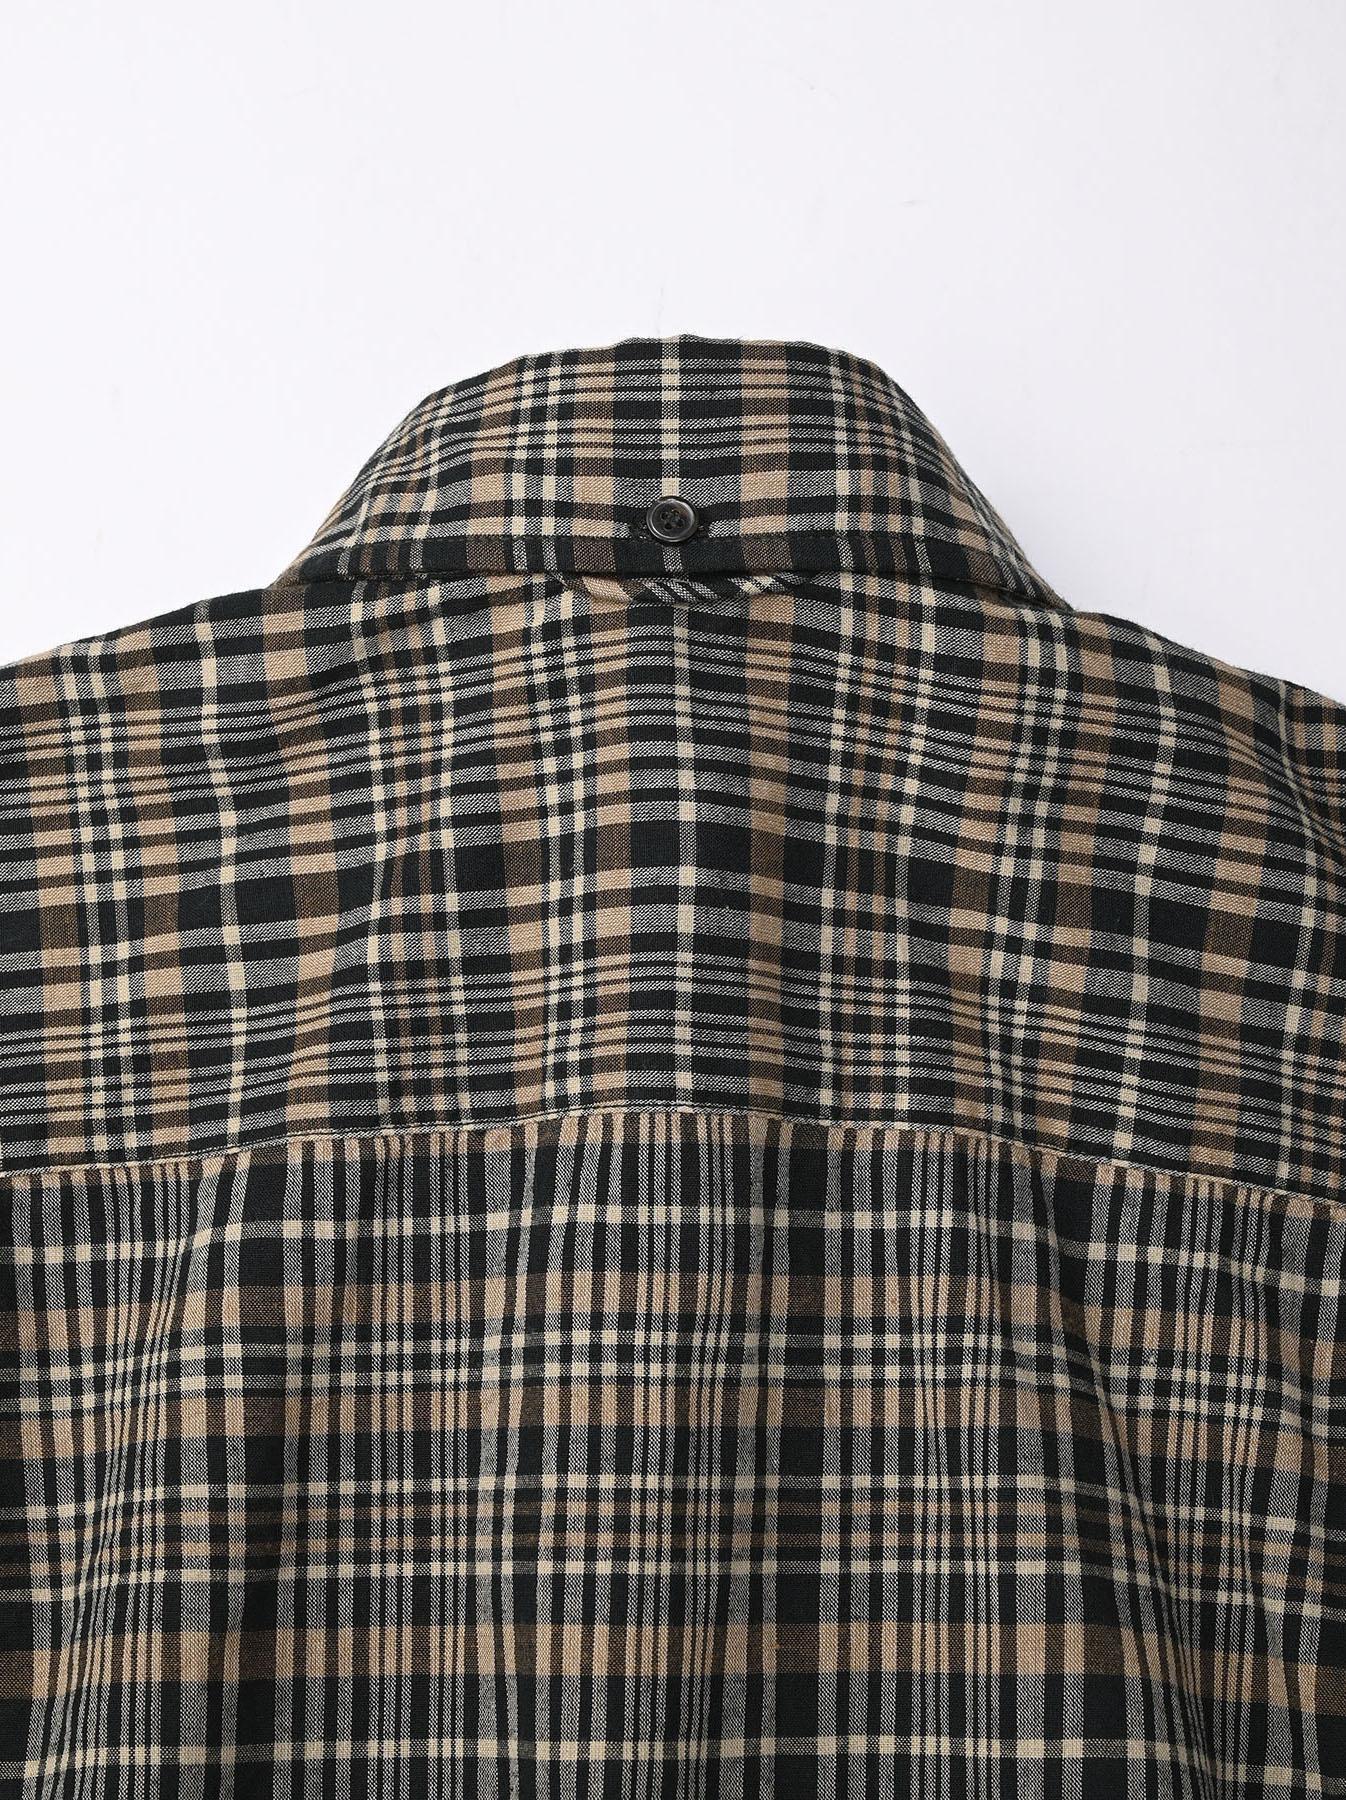 Indian Mugi-hira 908 Ocean Button Down Shirt (0421)-9